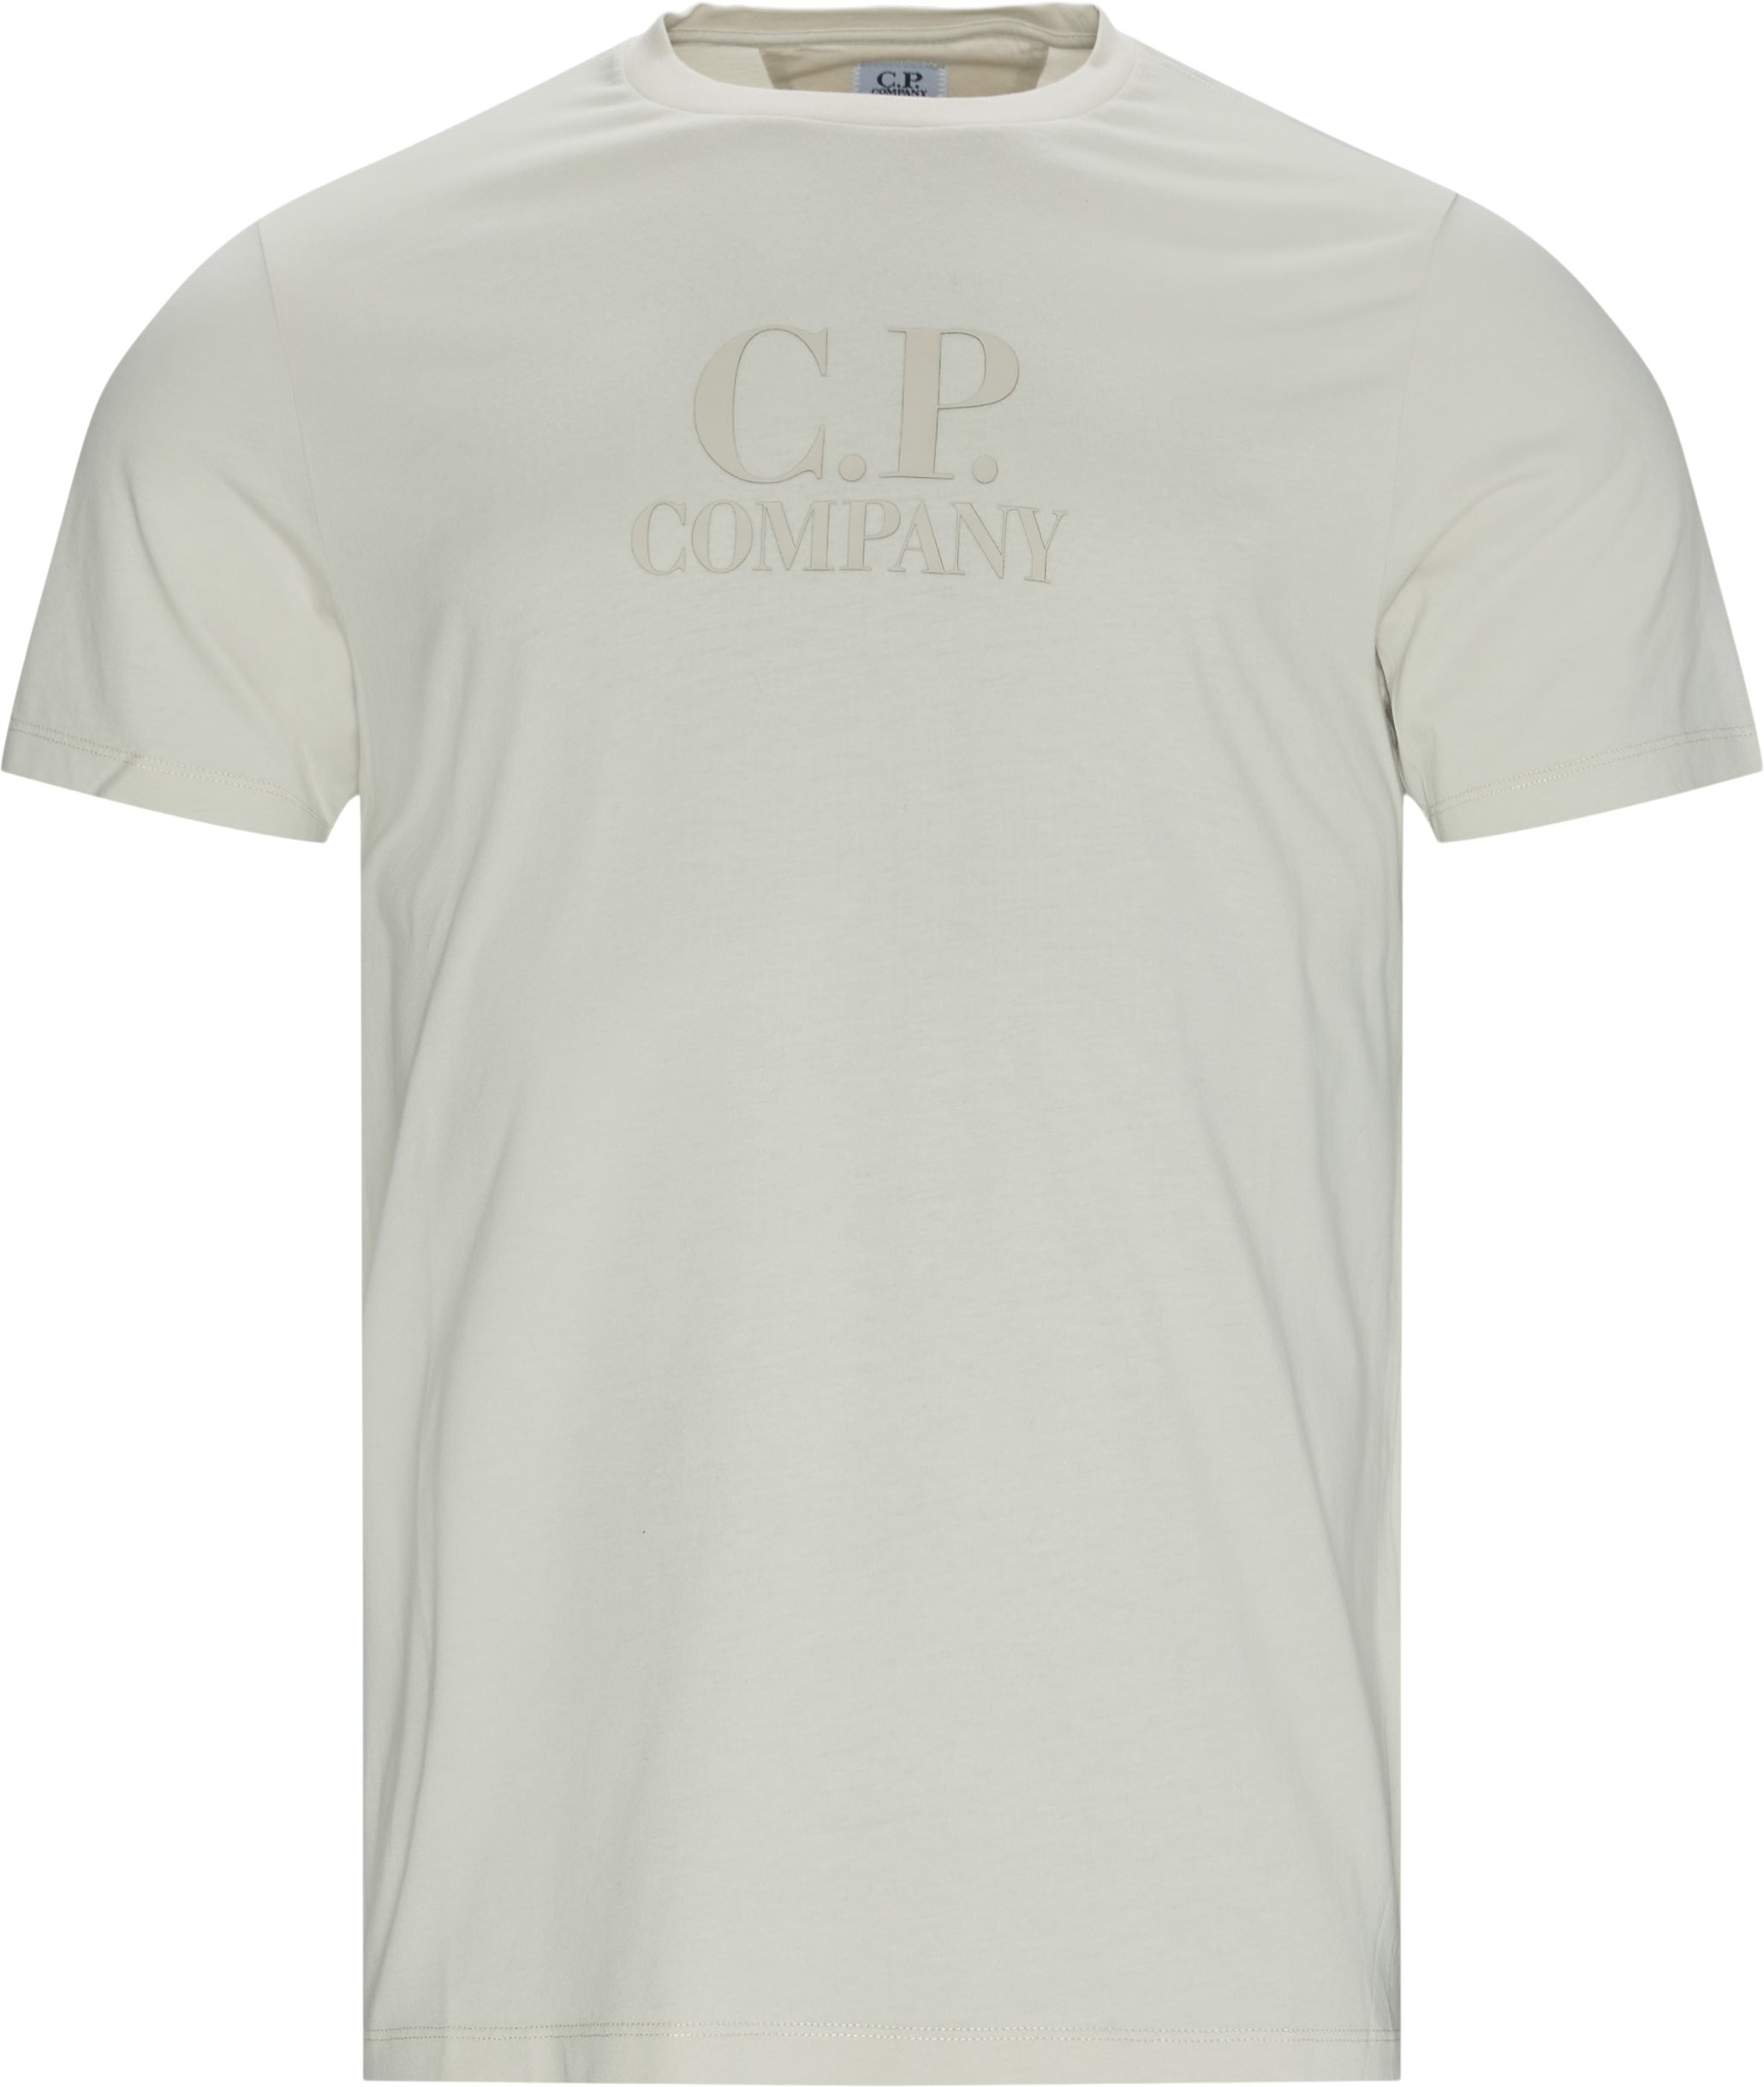 Jersey Tee - T-shirts - Regular fit - Sand